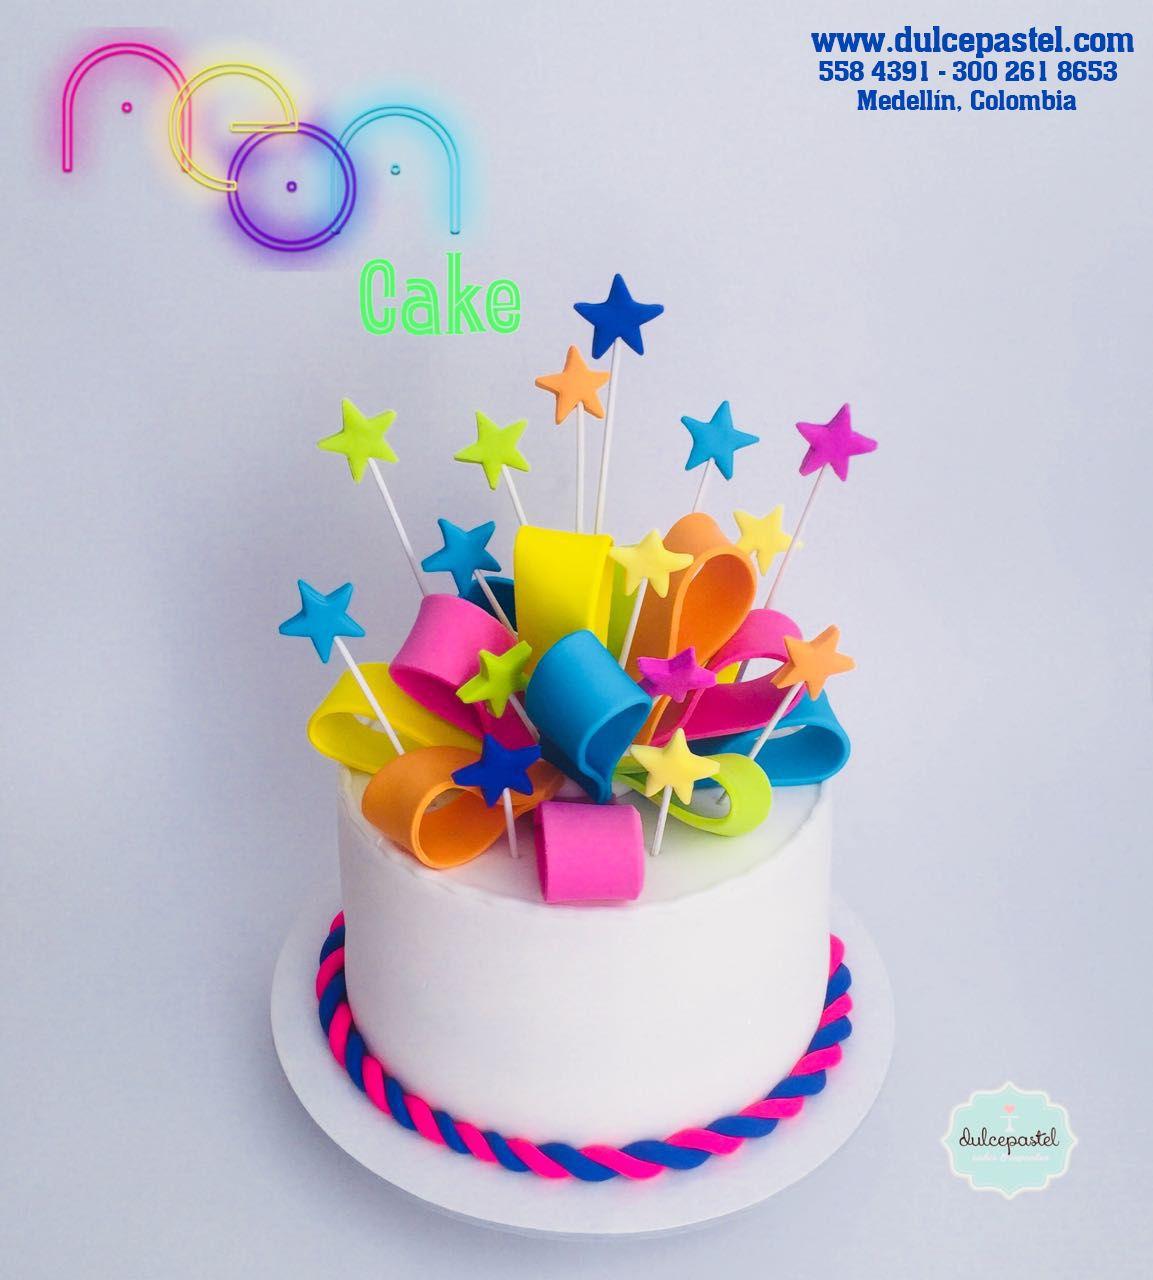 Torta Nen en Medelln por Dulcepastelcom Neon Cake in Medellin